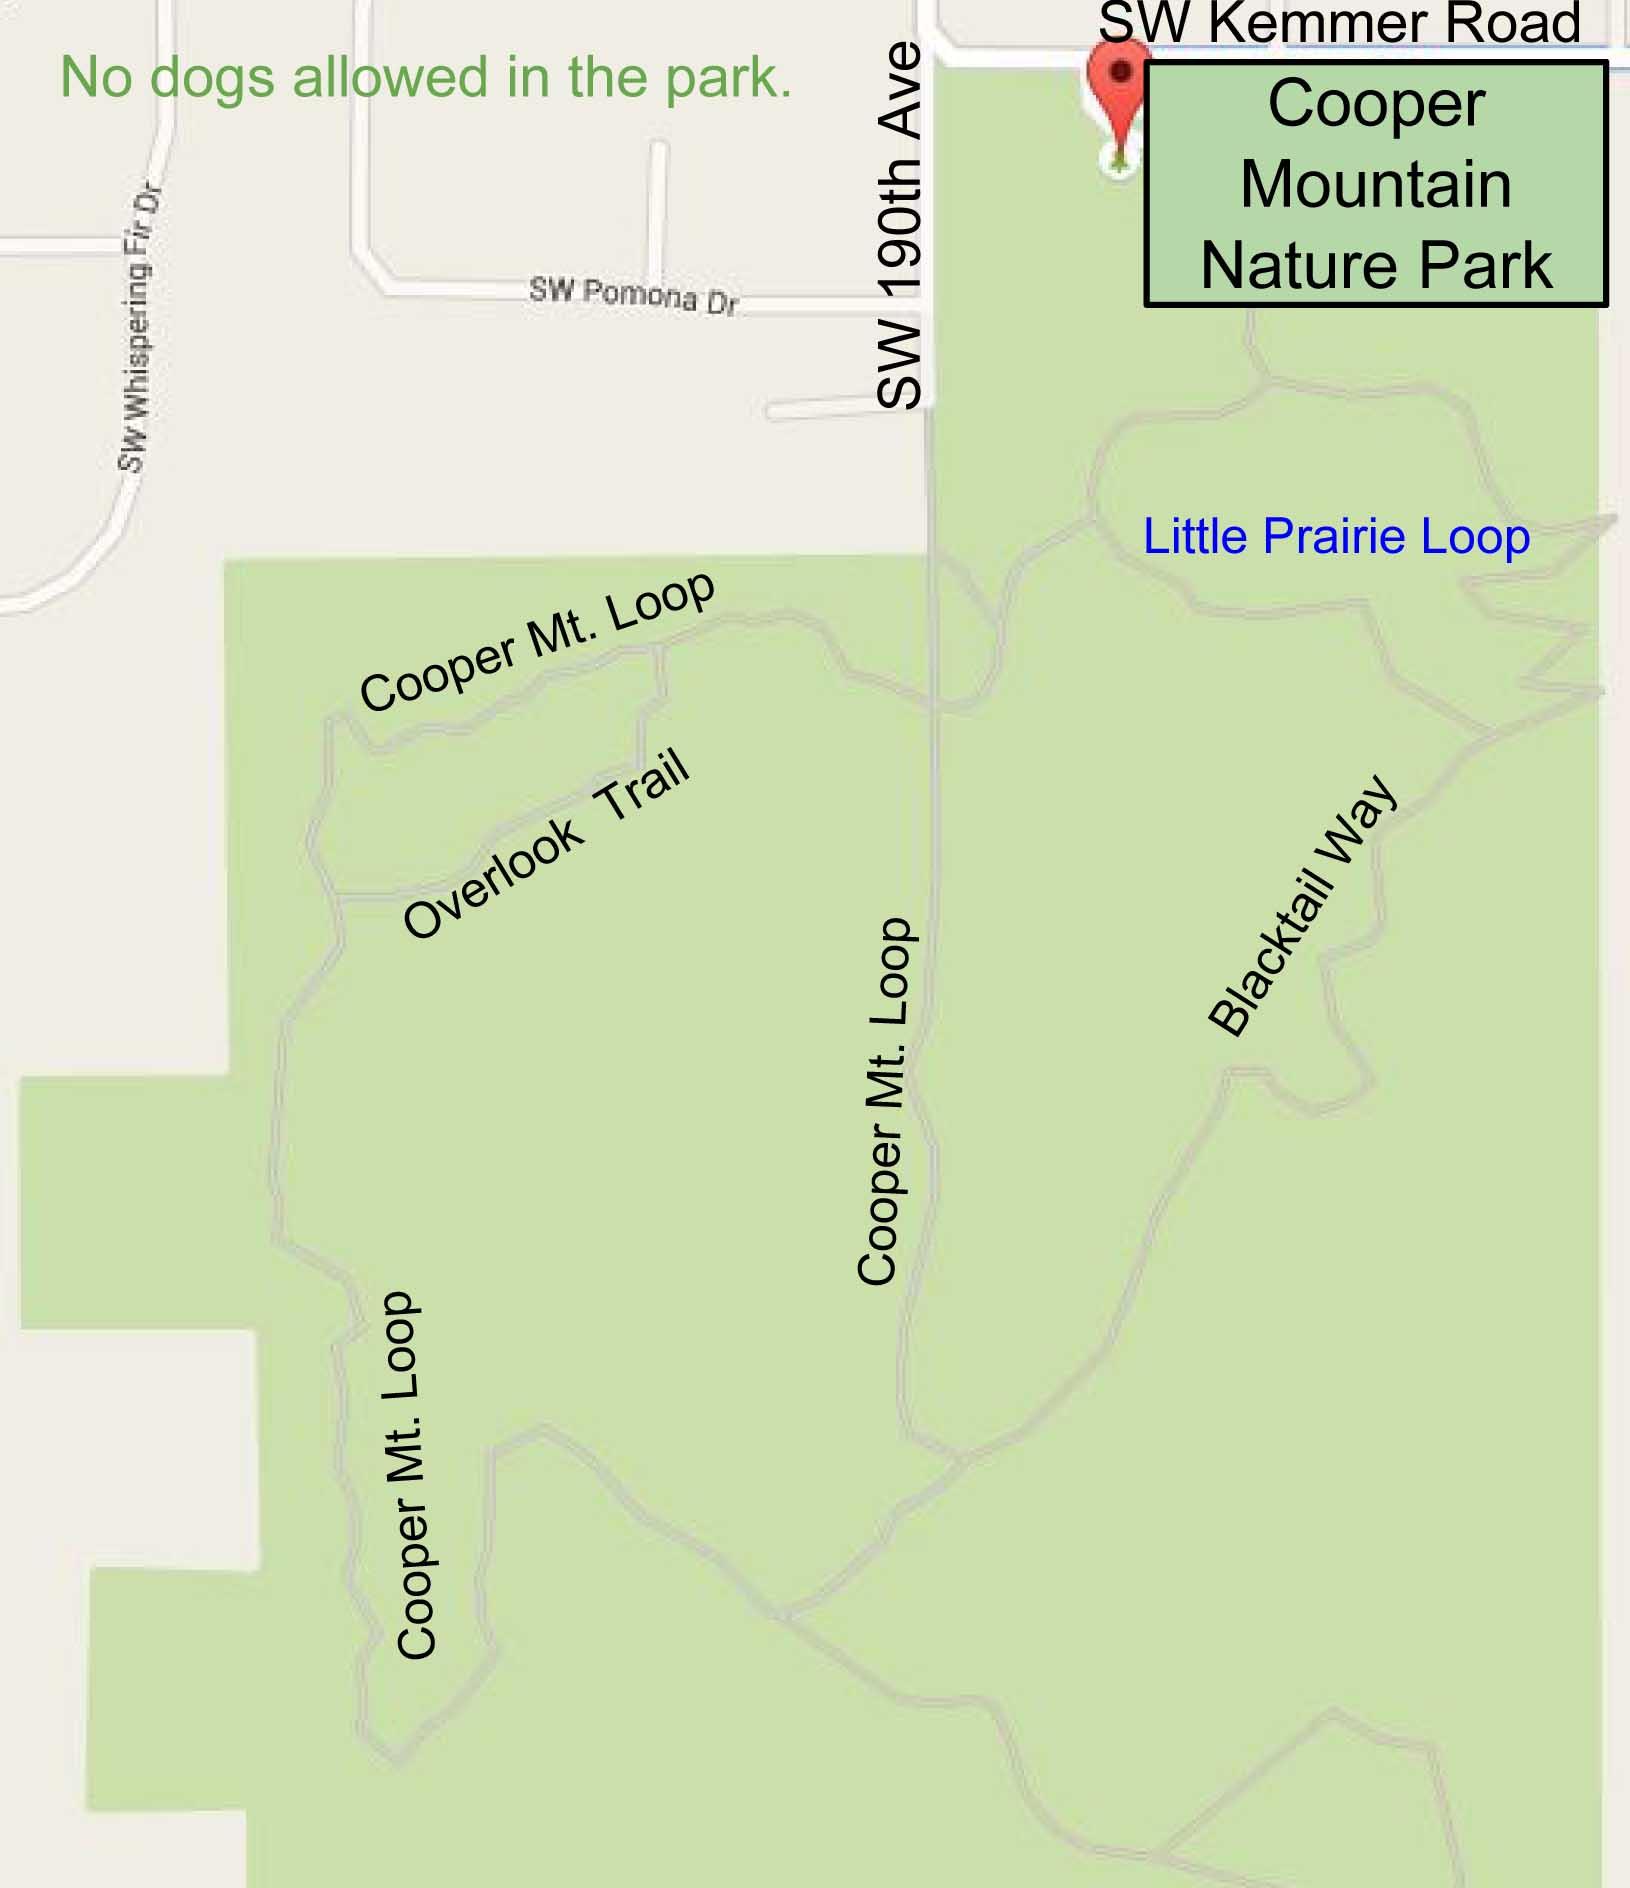 Cooper Mountain Map